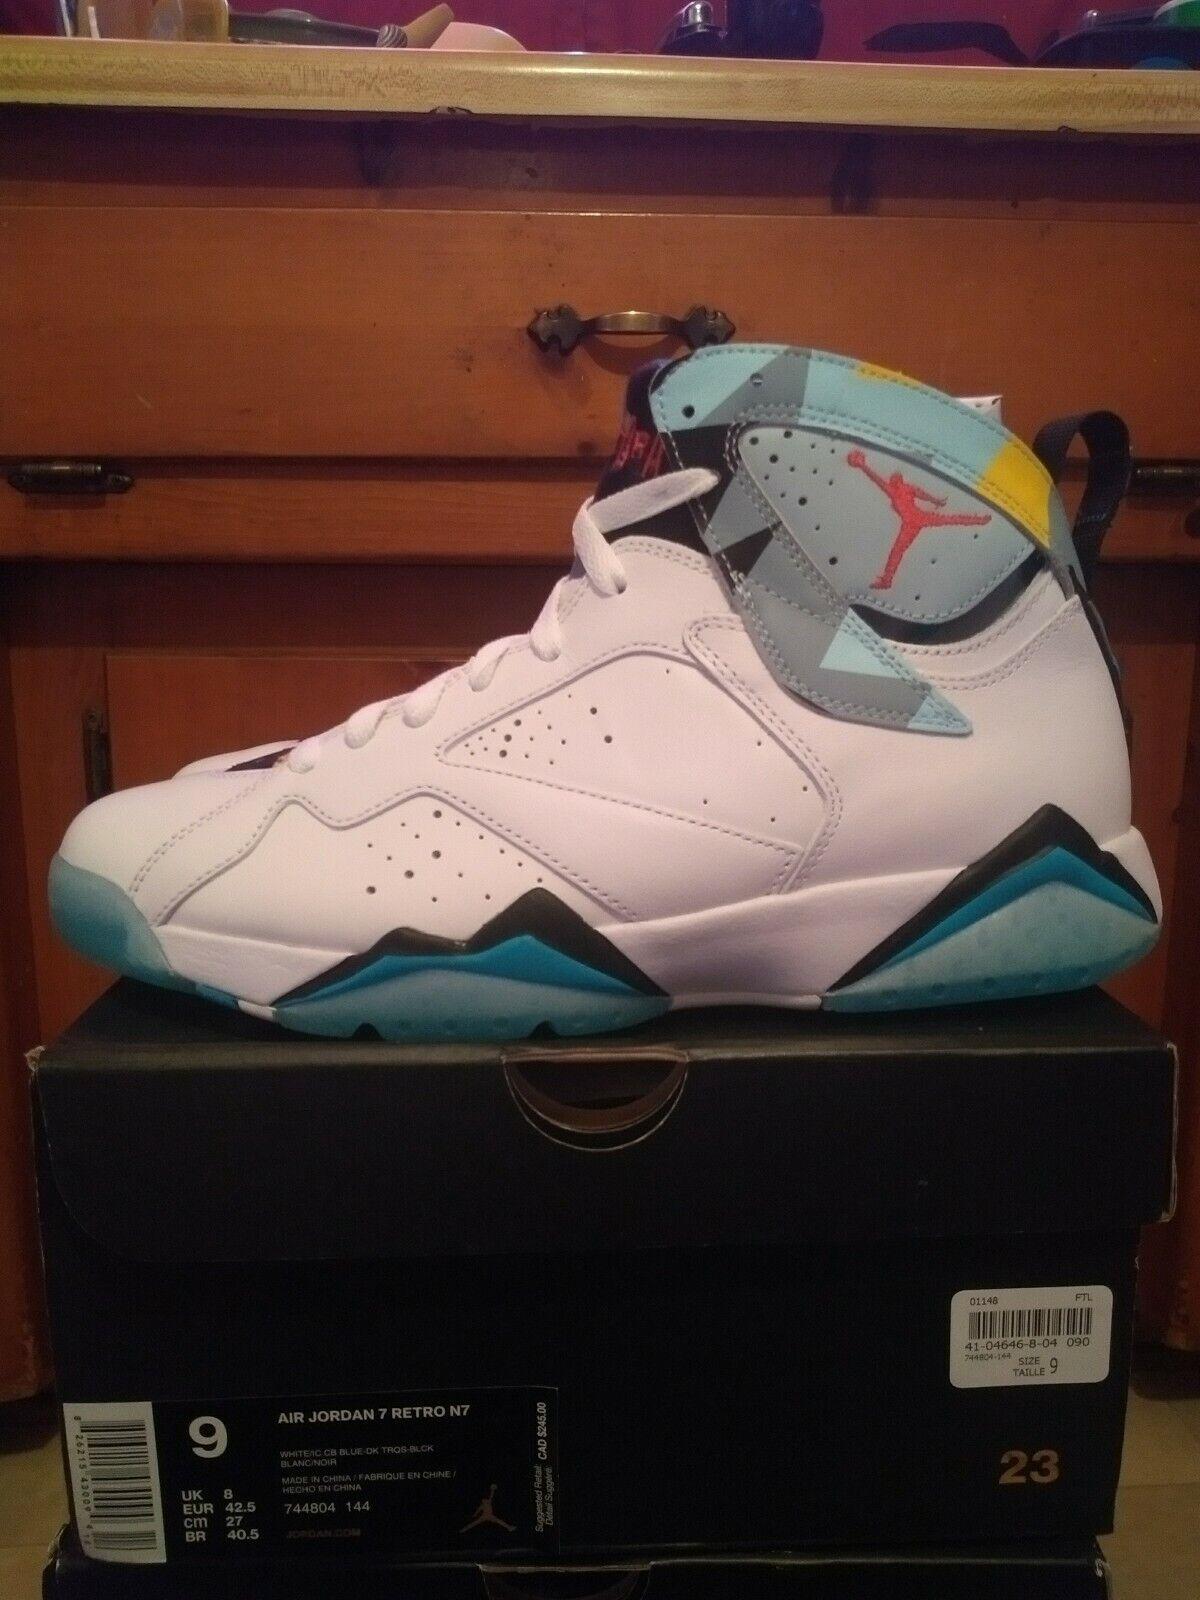 Jordan 7 N7 bluee White Size 9 DS